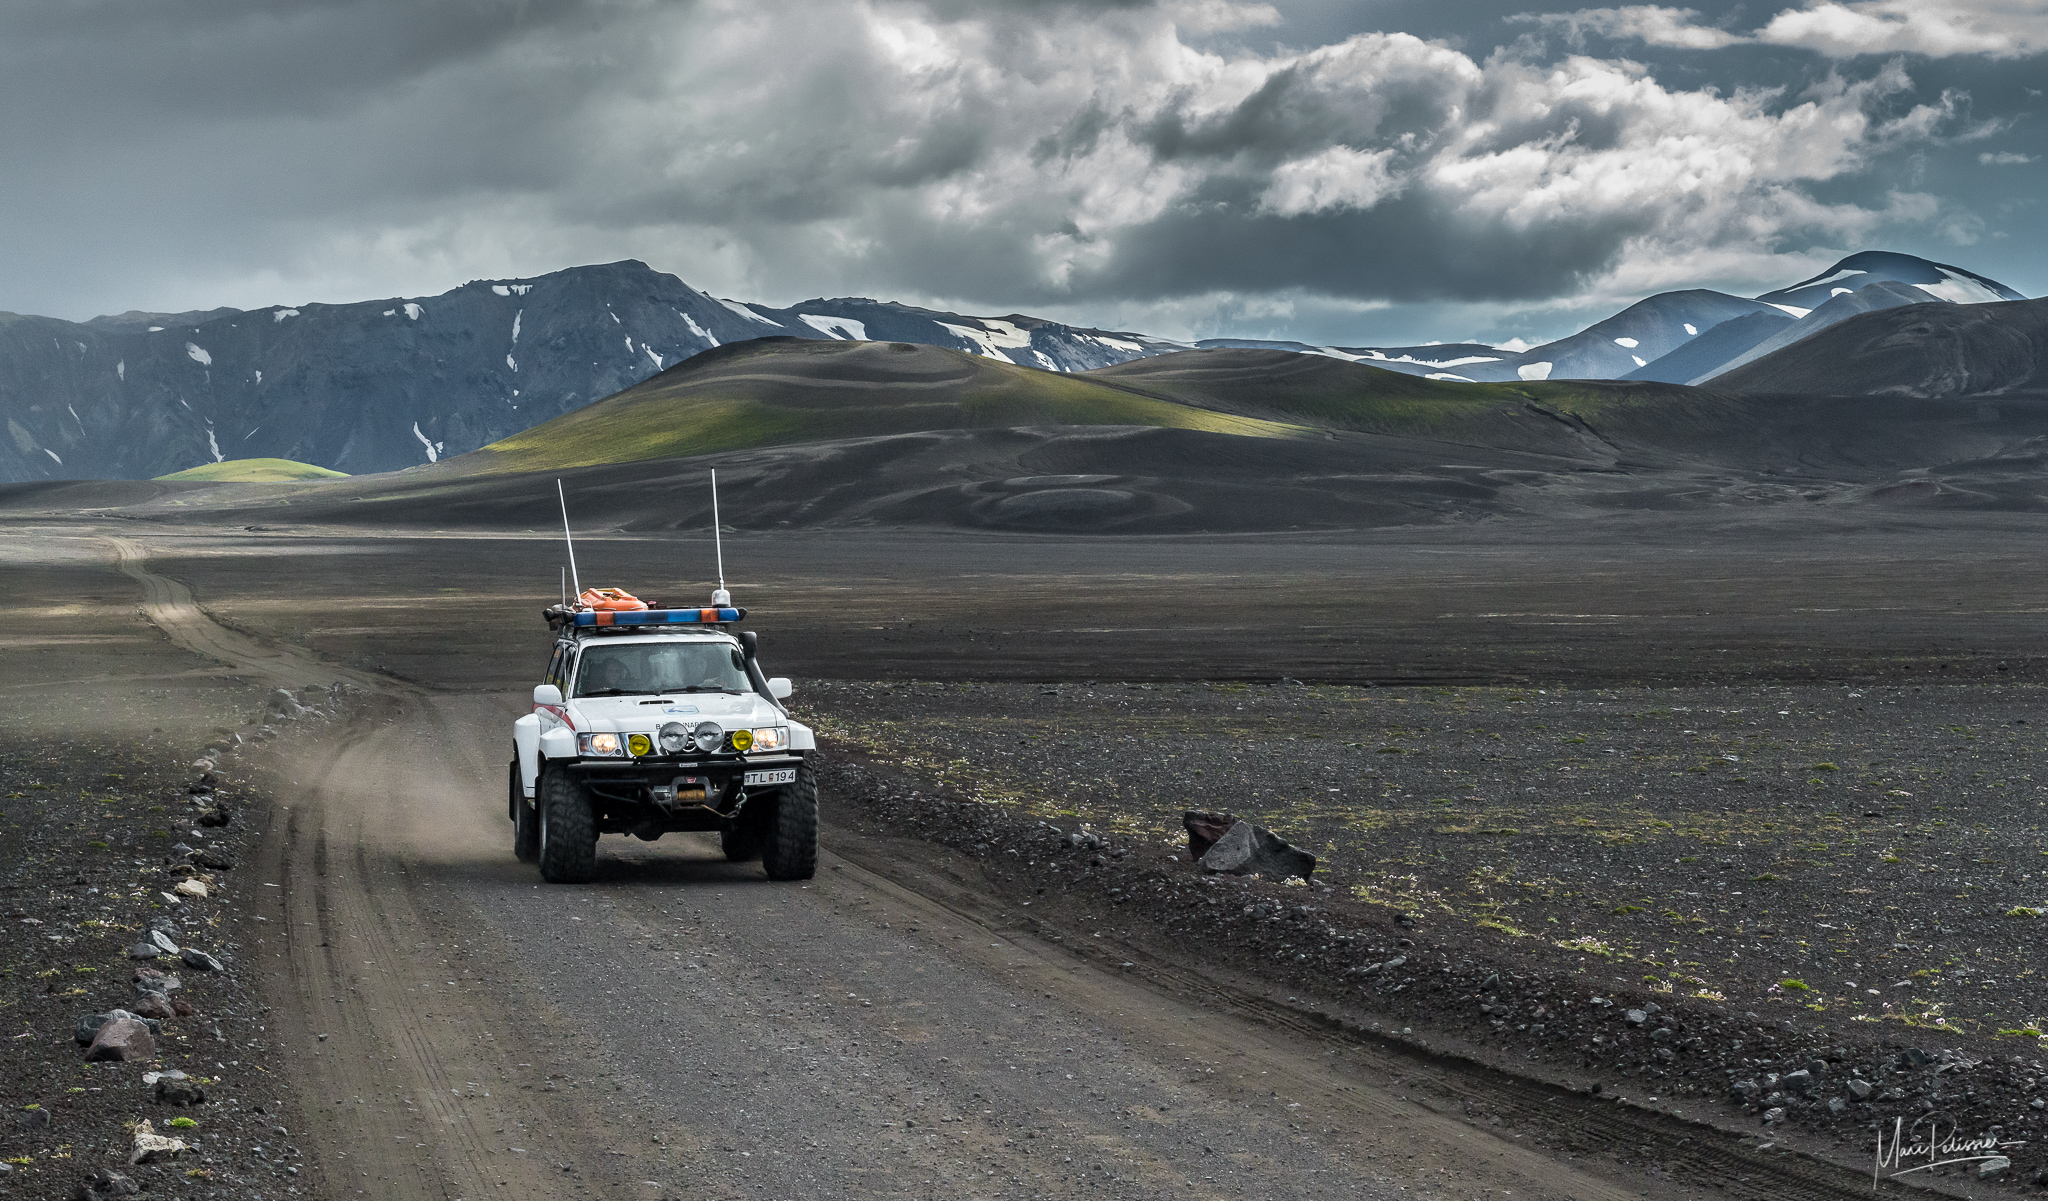 F208 track to Landmannalaugar, Iceland